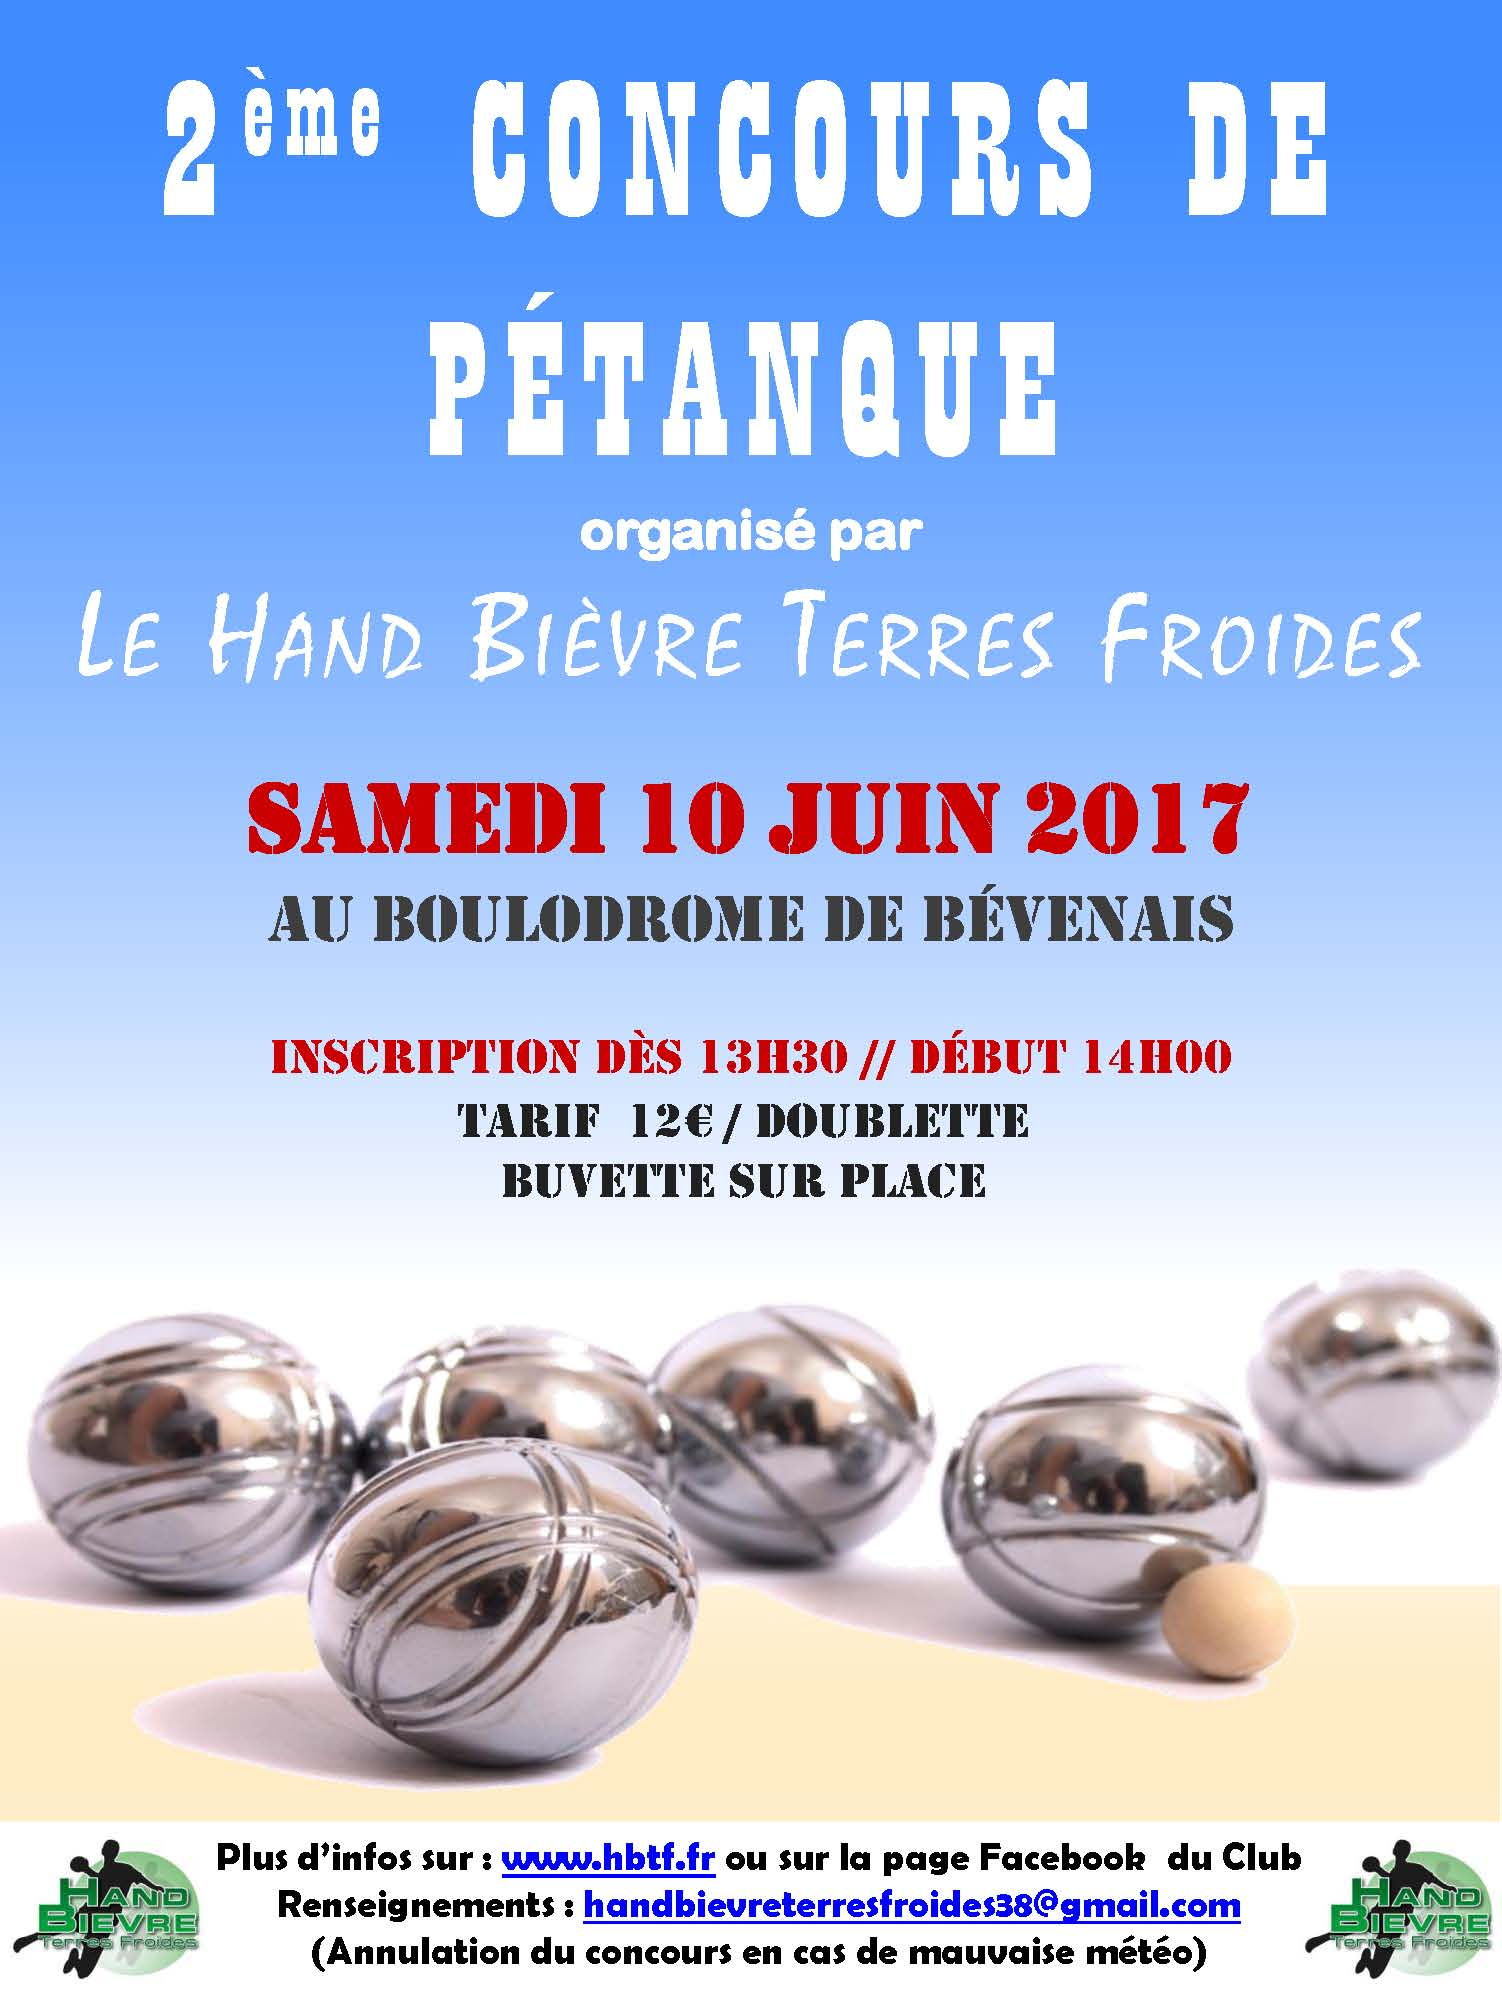 2ème concours de pétanque du HBTF - Hand Bievre Terres Froides - Club de Handball en Isère